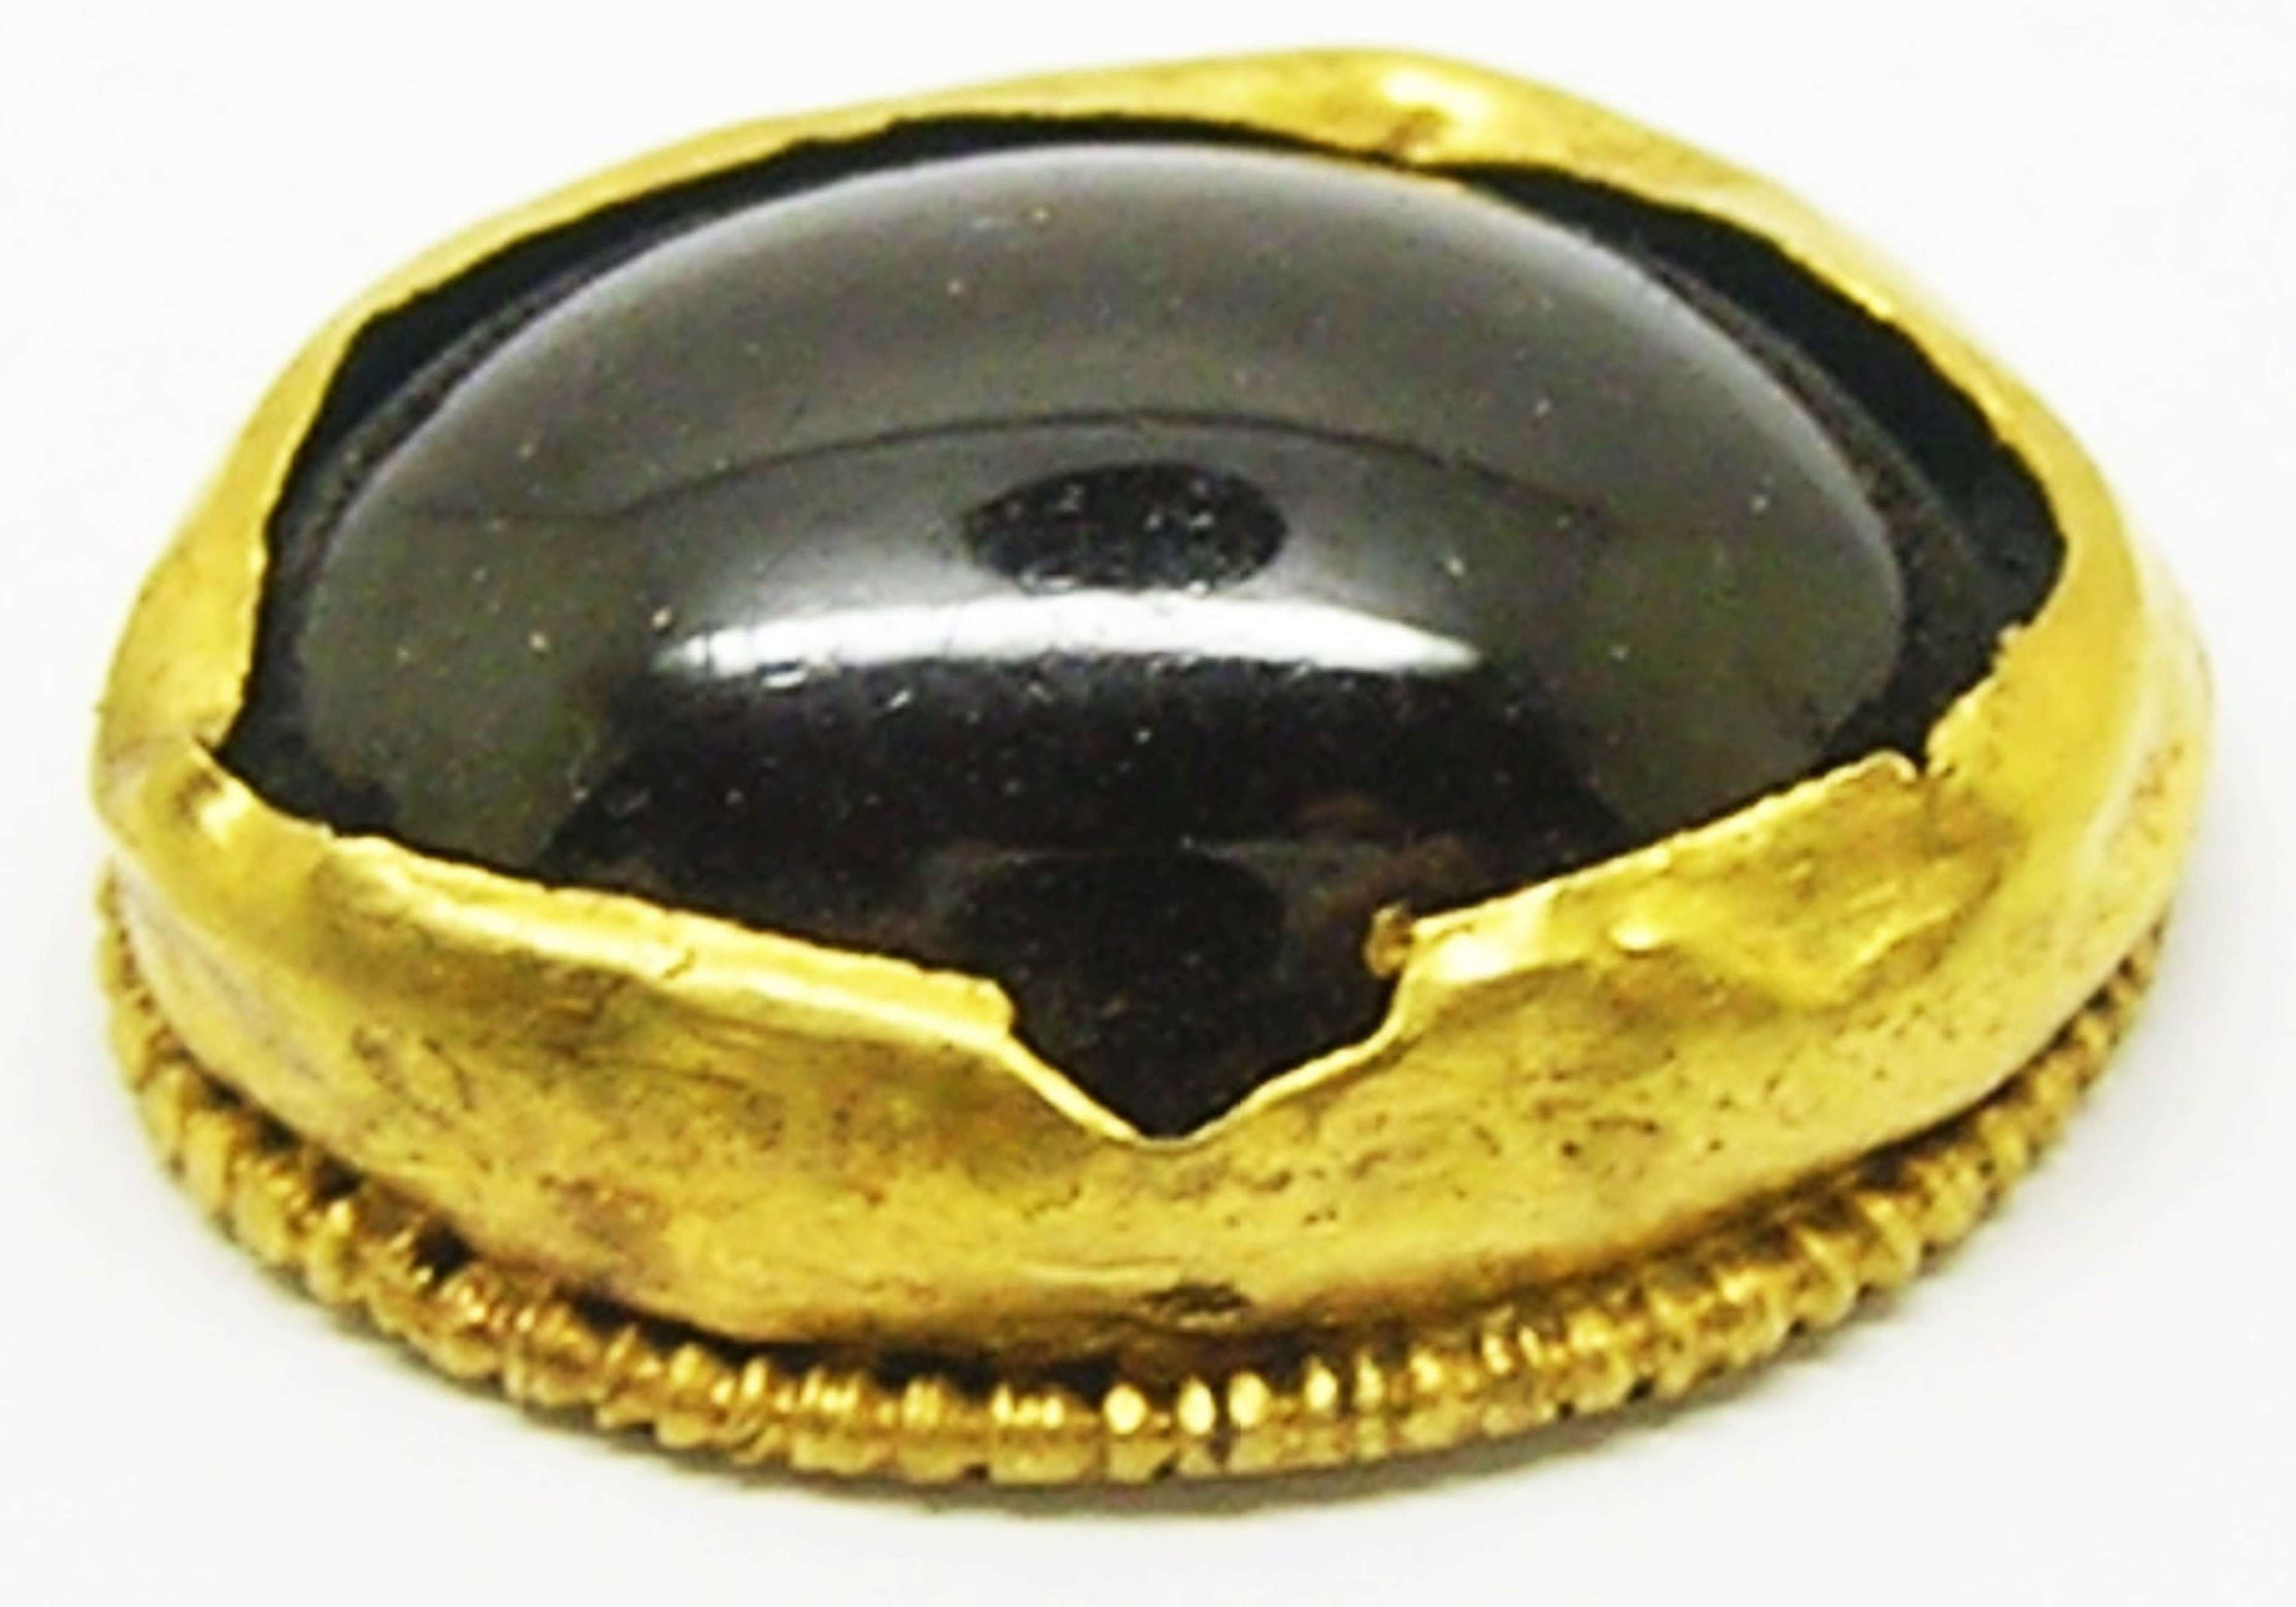 Merovingian Saxon period gold and garnet scabbard button